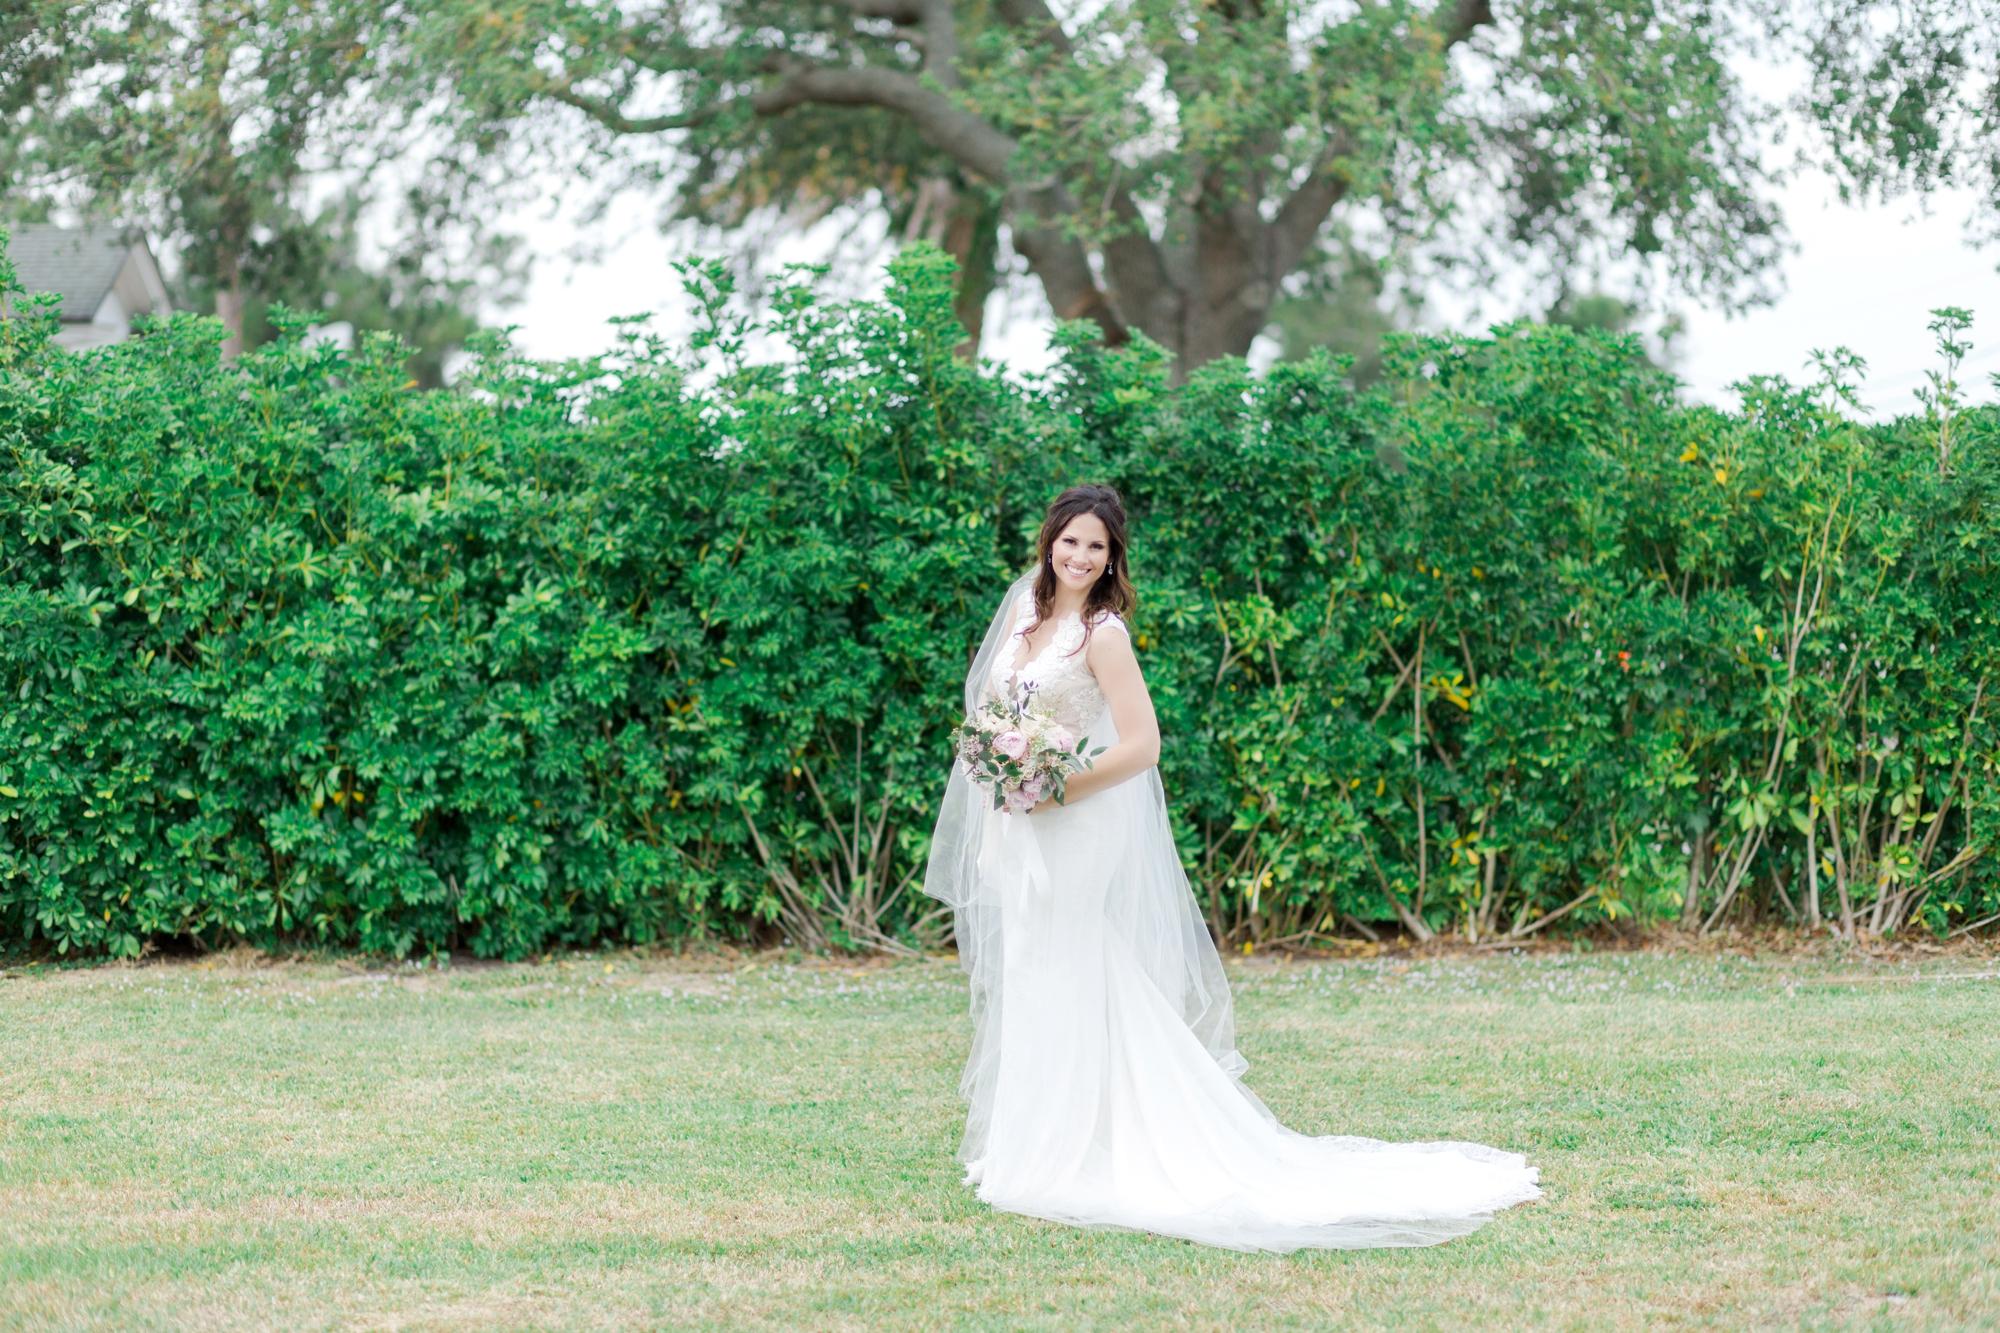 long veil and wedding dress